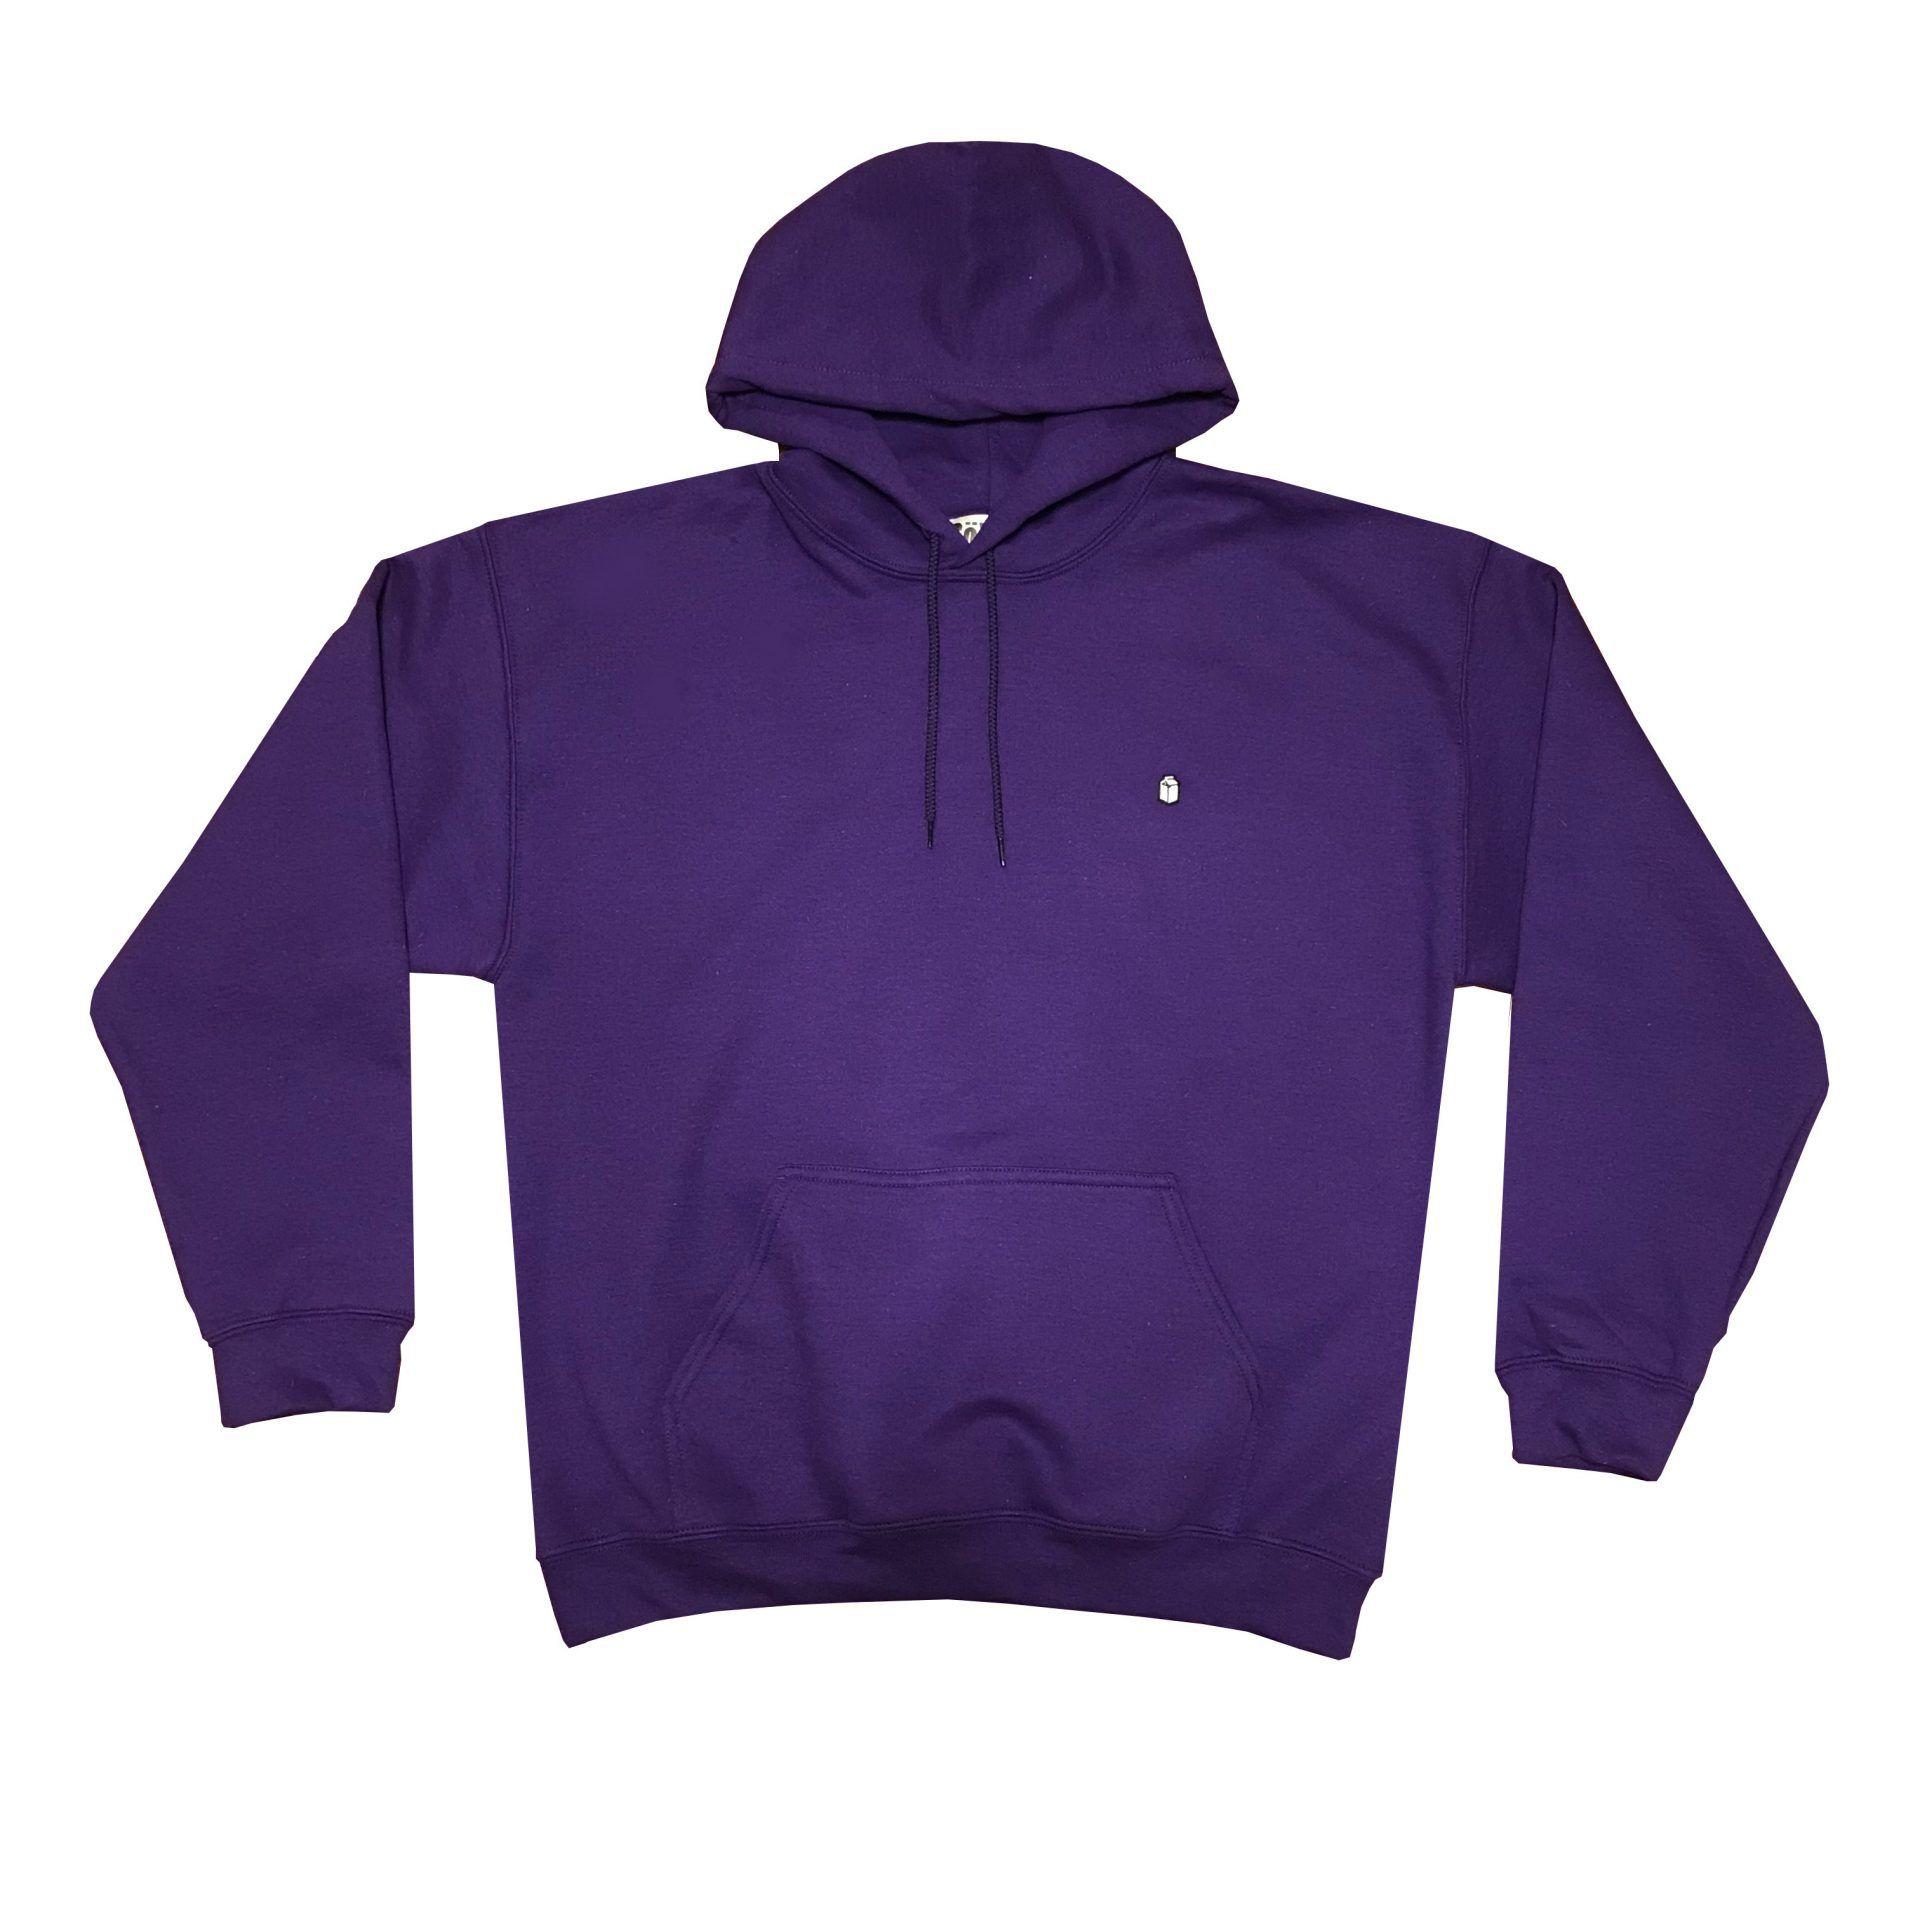 SoYou Clothing Basics Hoodie in Purple City Bird Gang